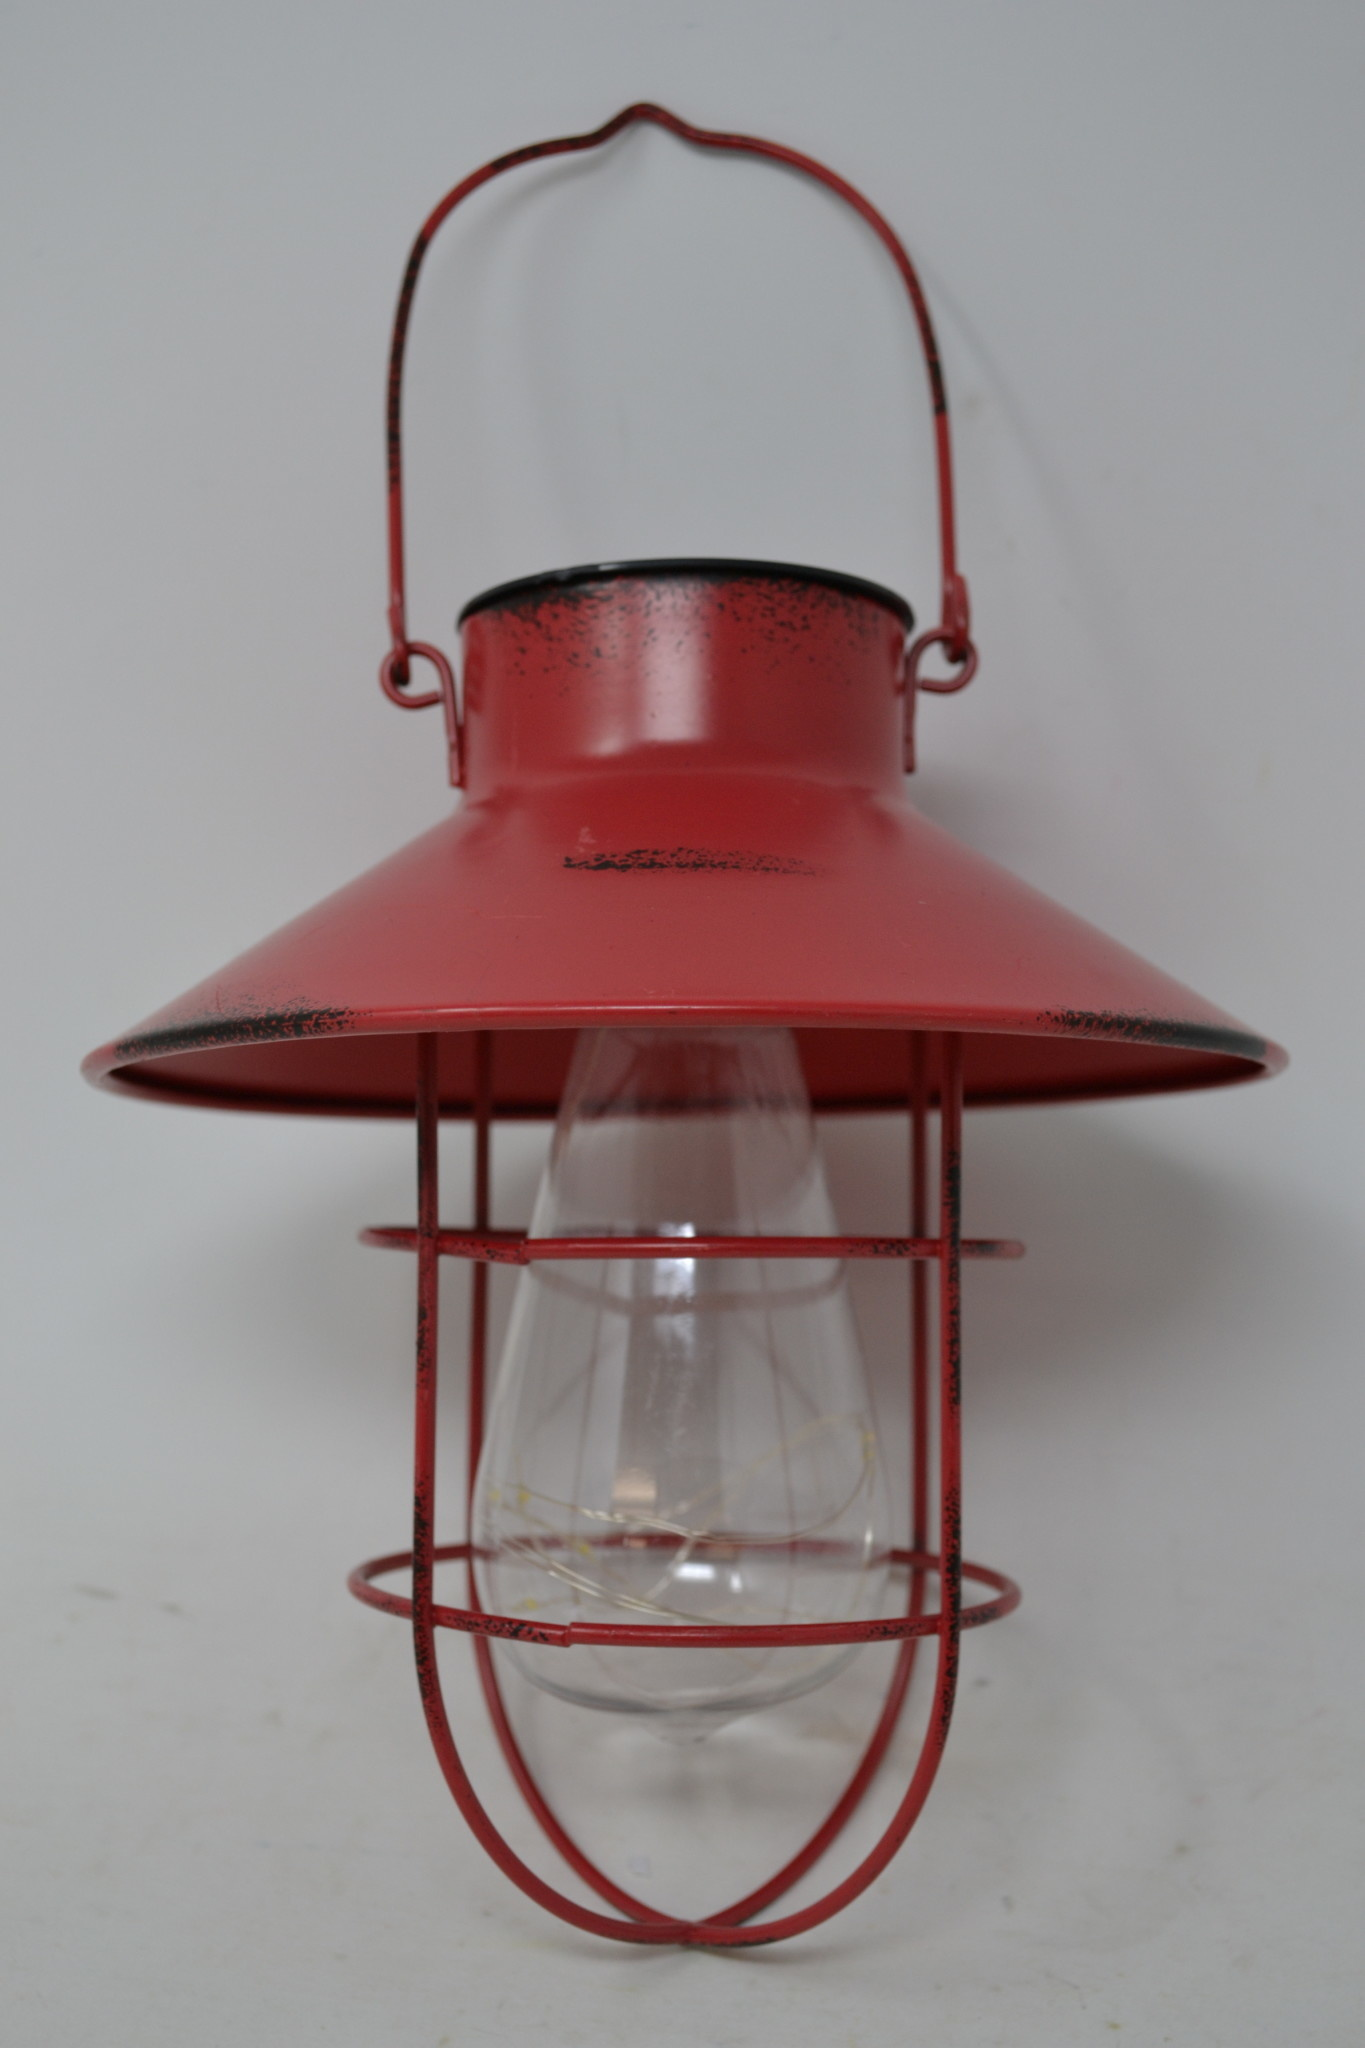 Antiqued Red Solar Hanging Light